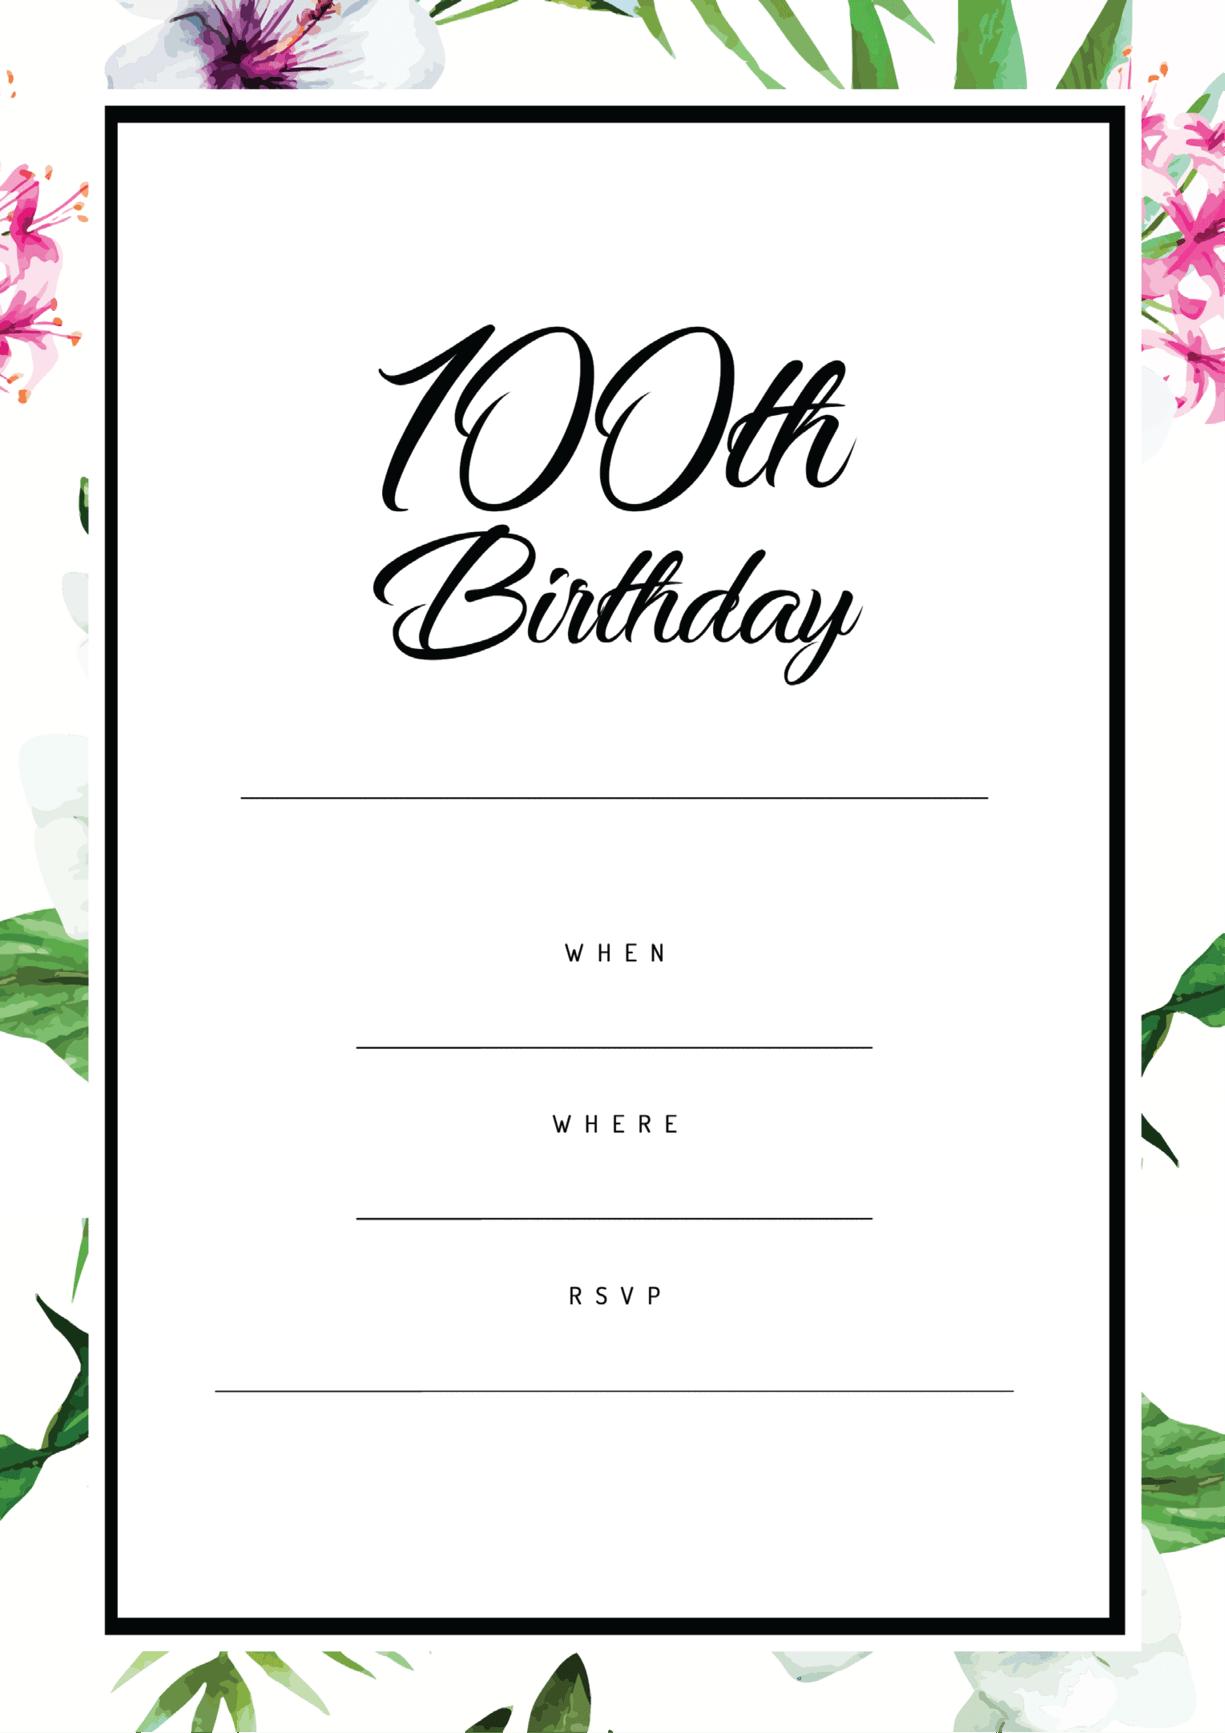 100th birthday party invitation tropical border